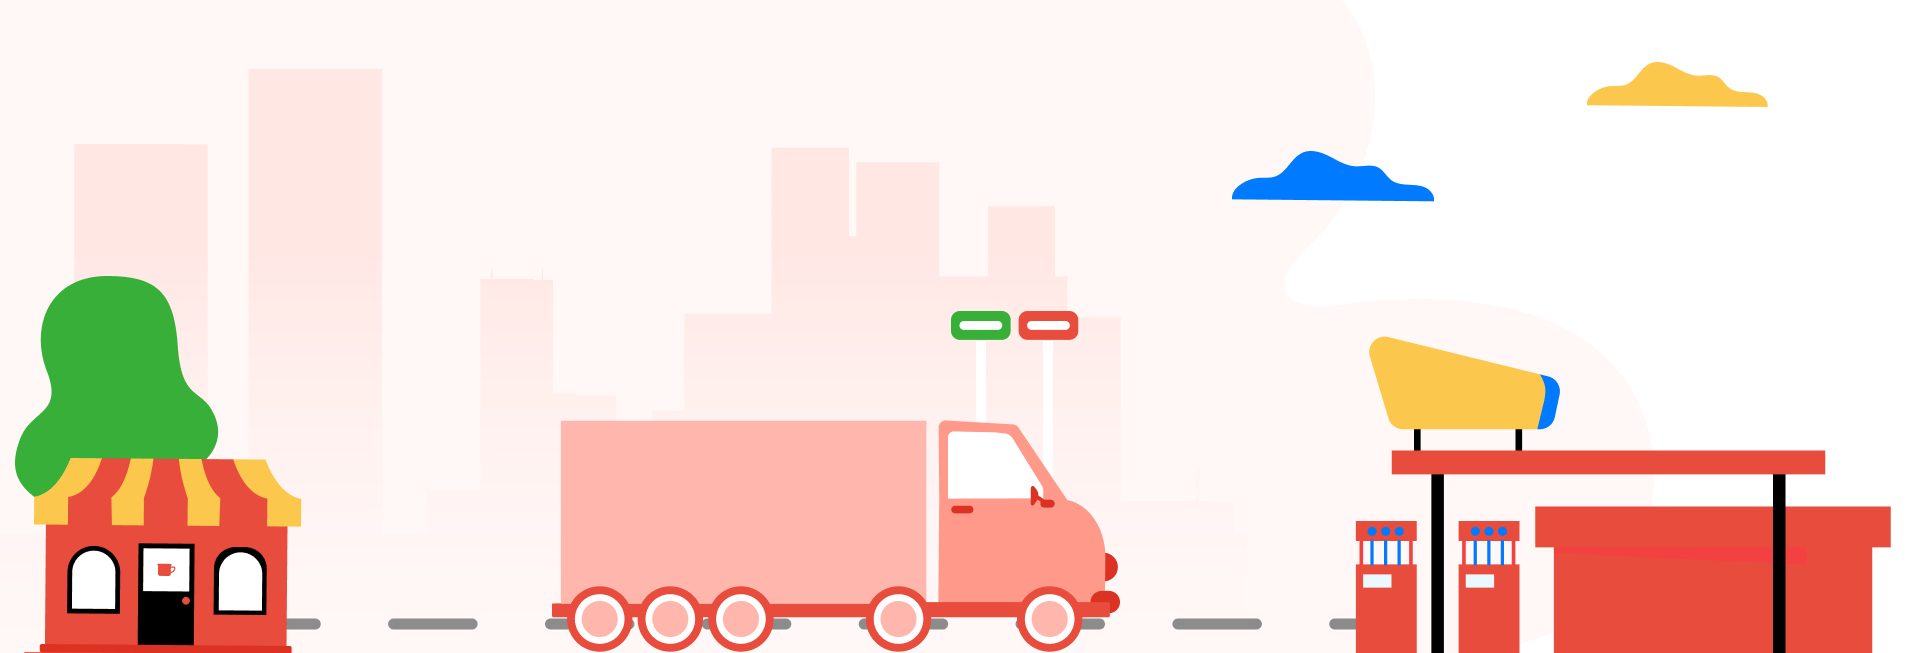 truckfly-image-publisher/advertiser-banner.png